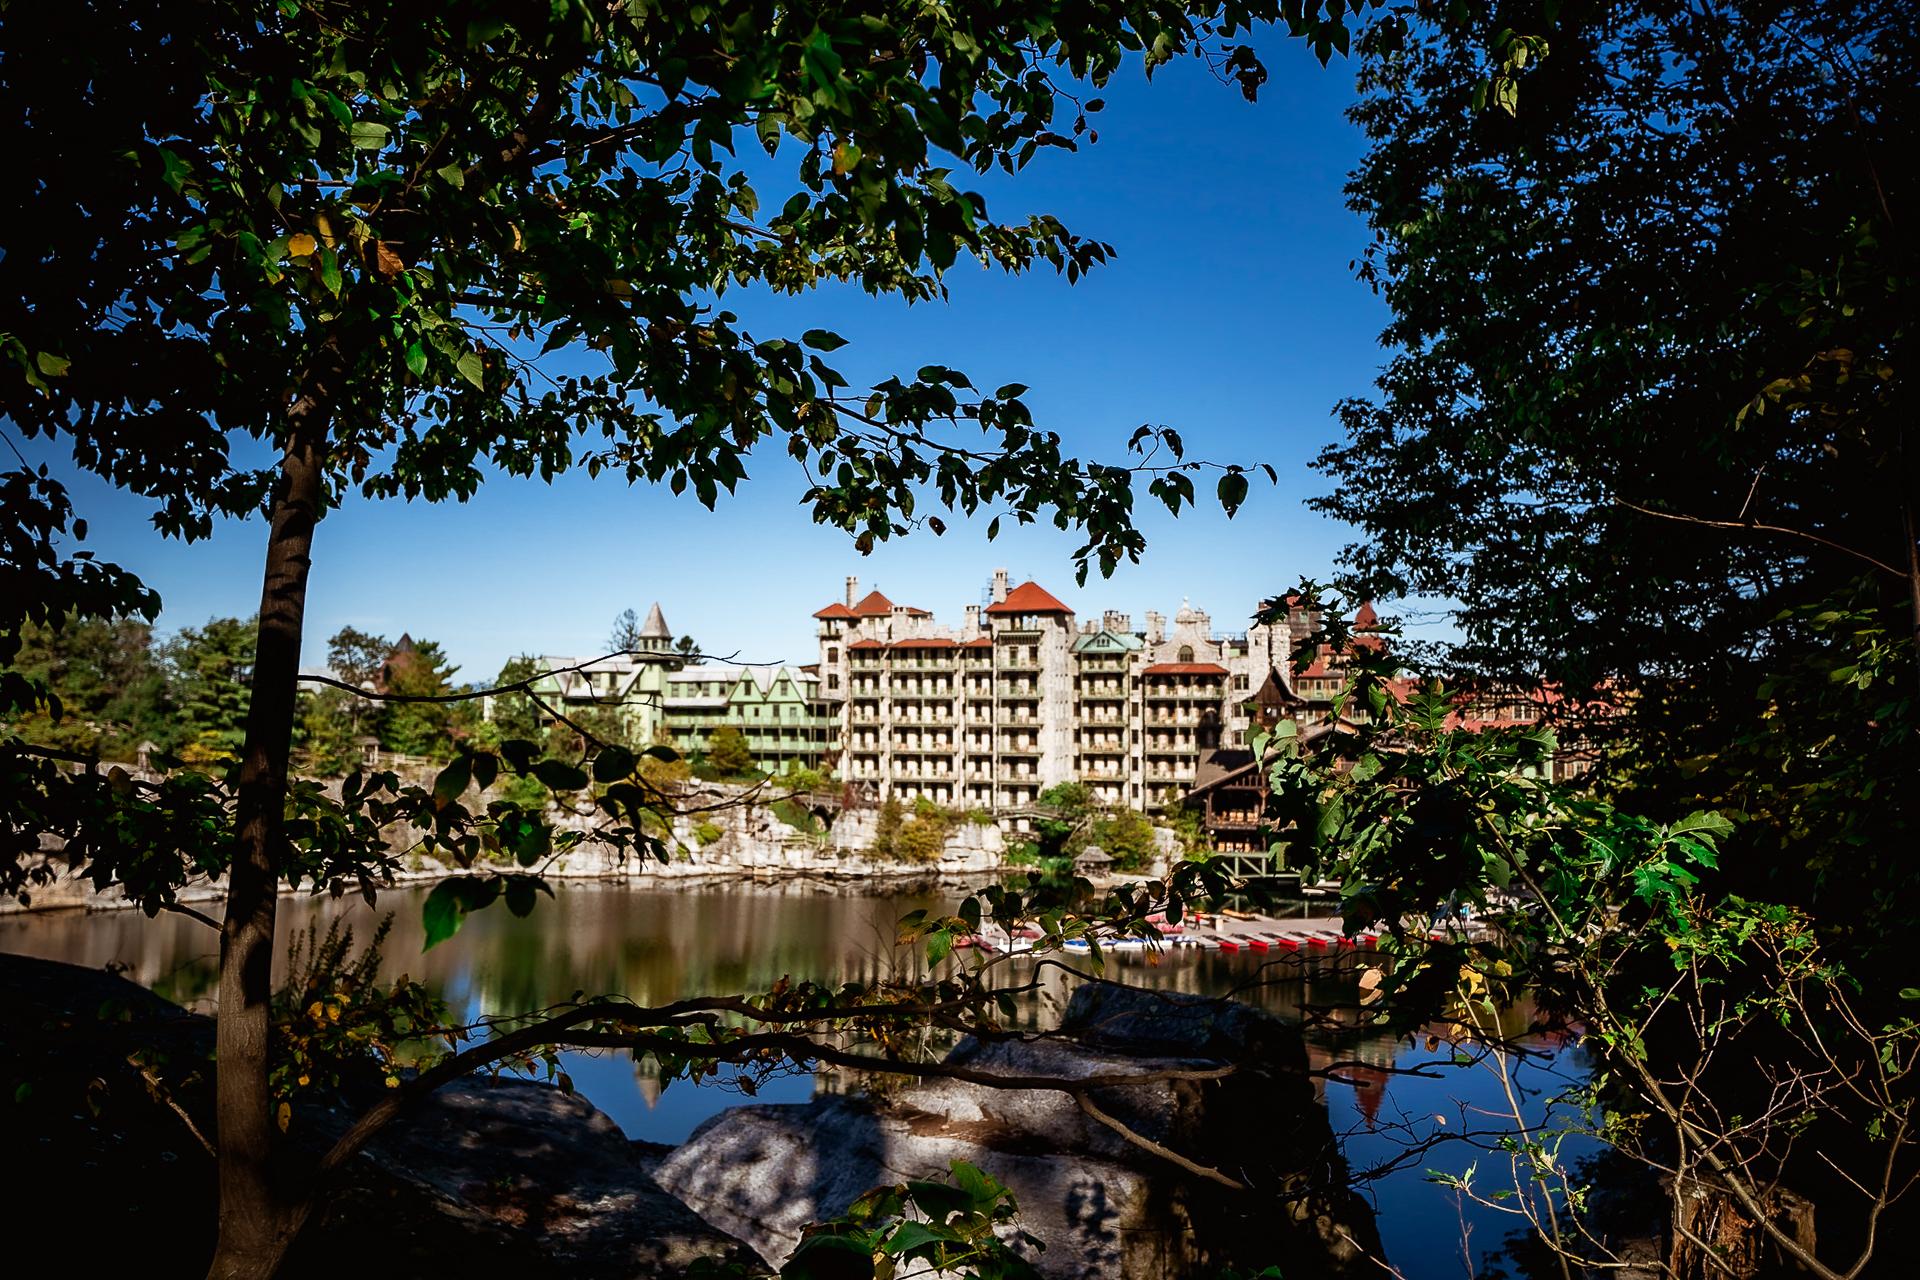 Hudson Valley Corporate photographer